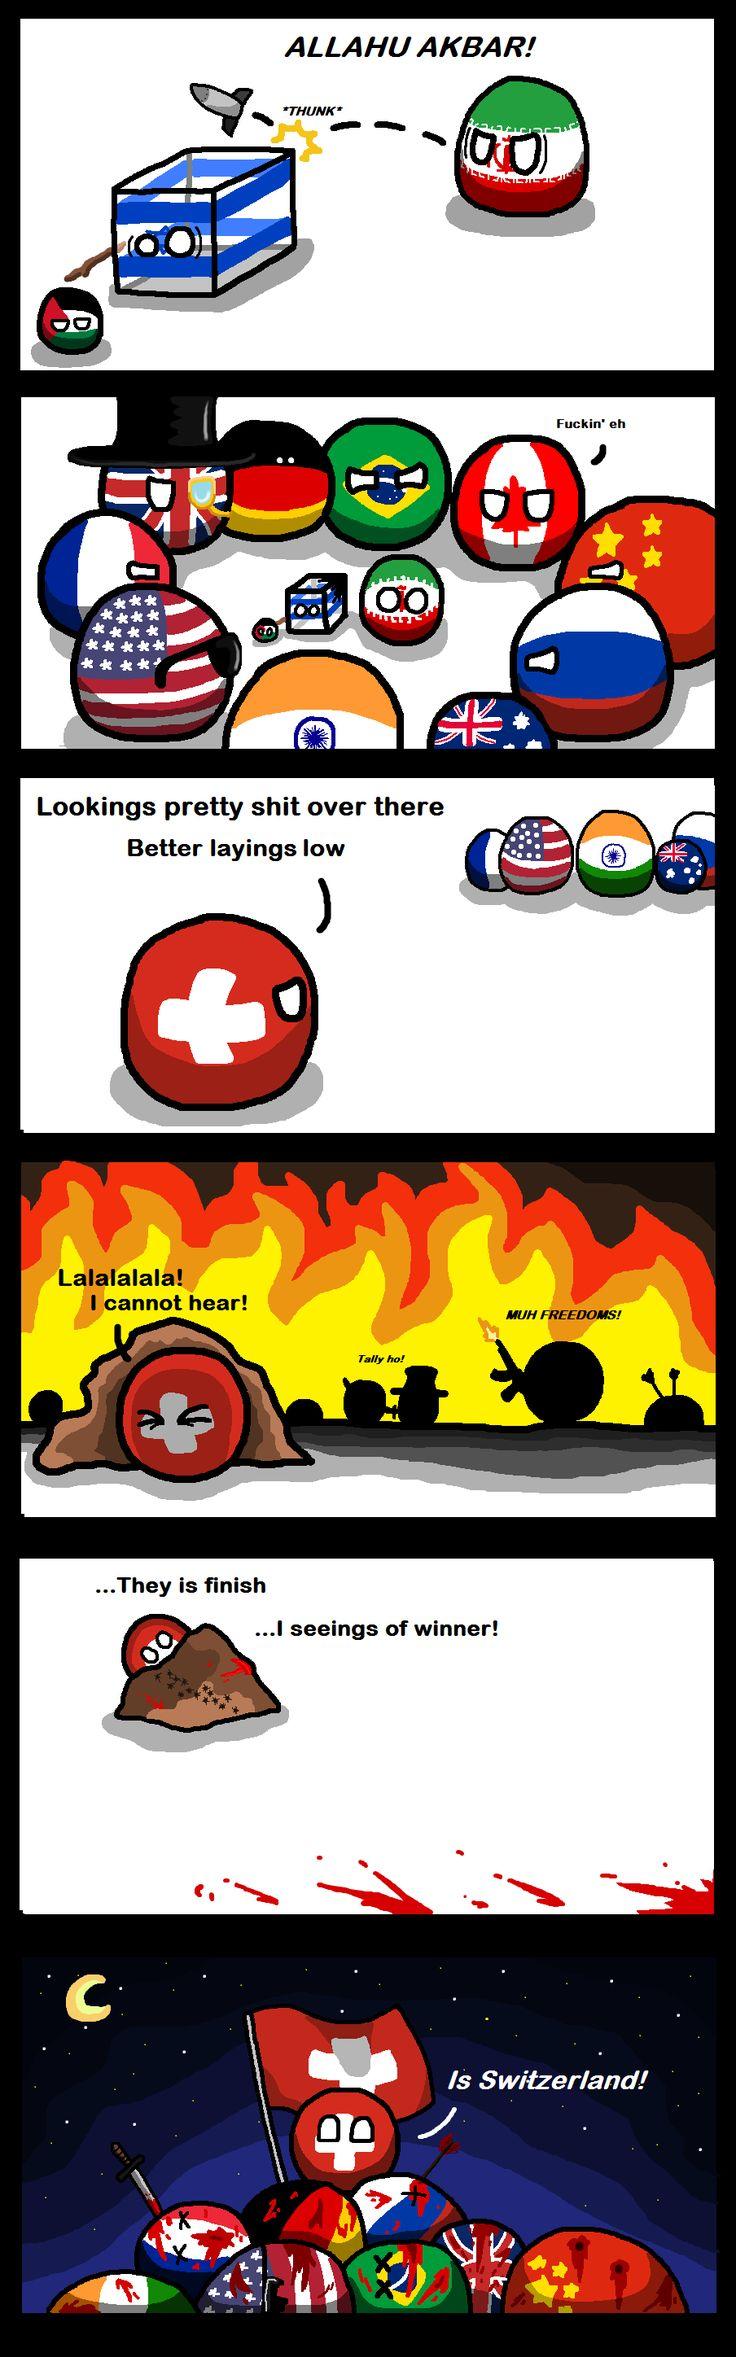 Winning by Default ( Switzerland ) by Pan Aaron #polandball #countryball